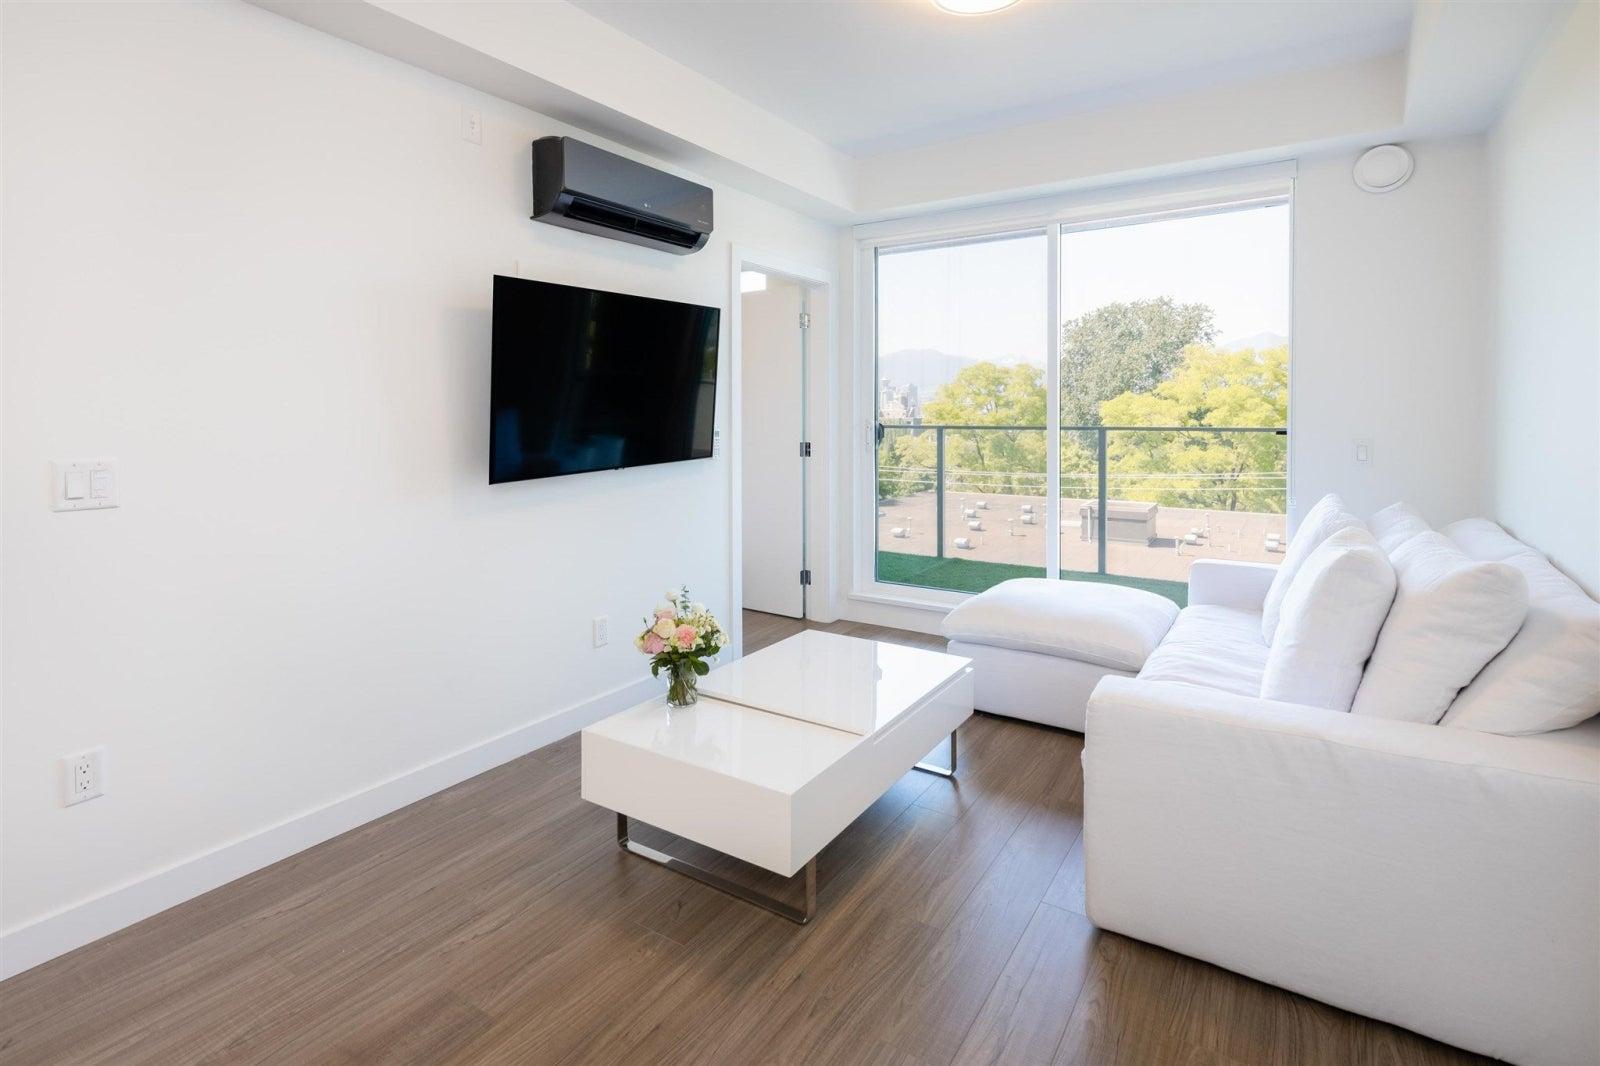 408 379 E BROADWAY AVENUE - Mount Pleasant VE Apartment/Condo for sale, 2 Bedrooms (R2599900) #9